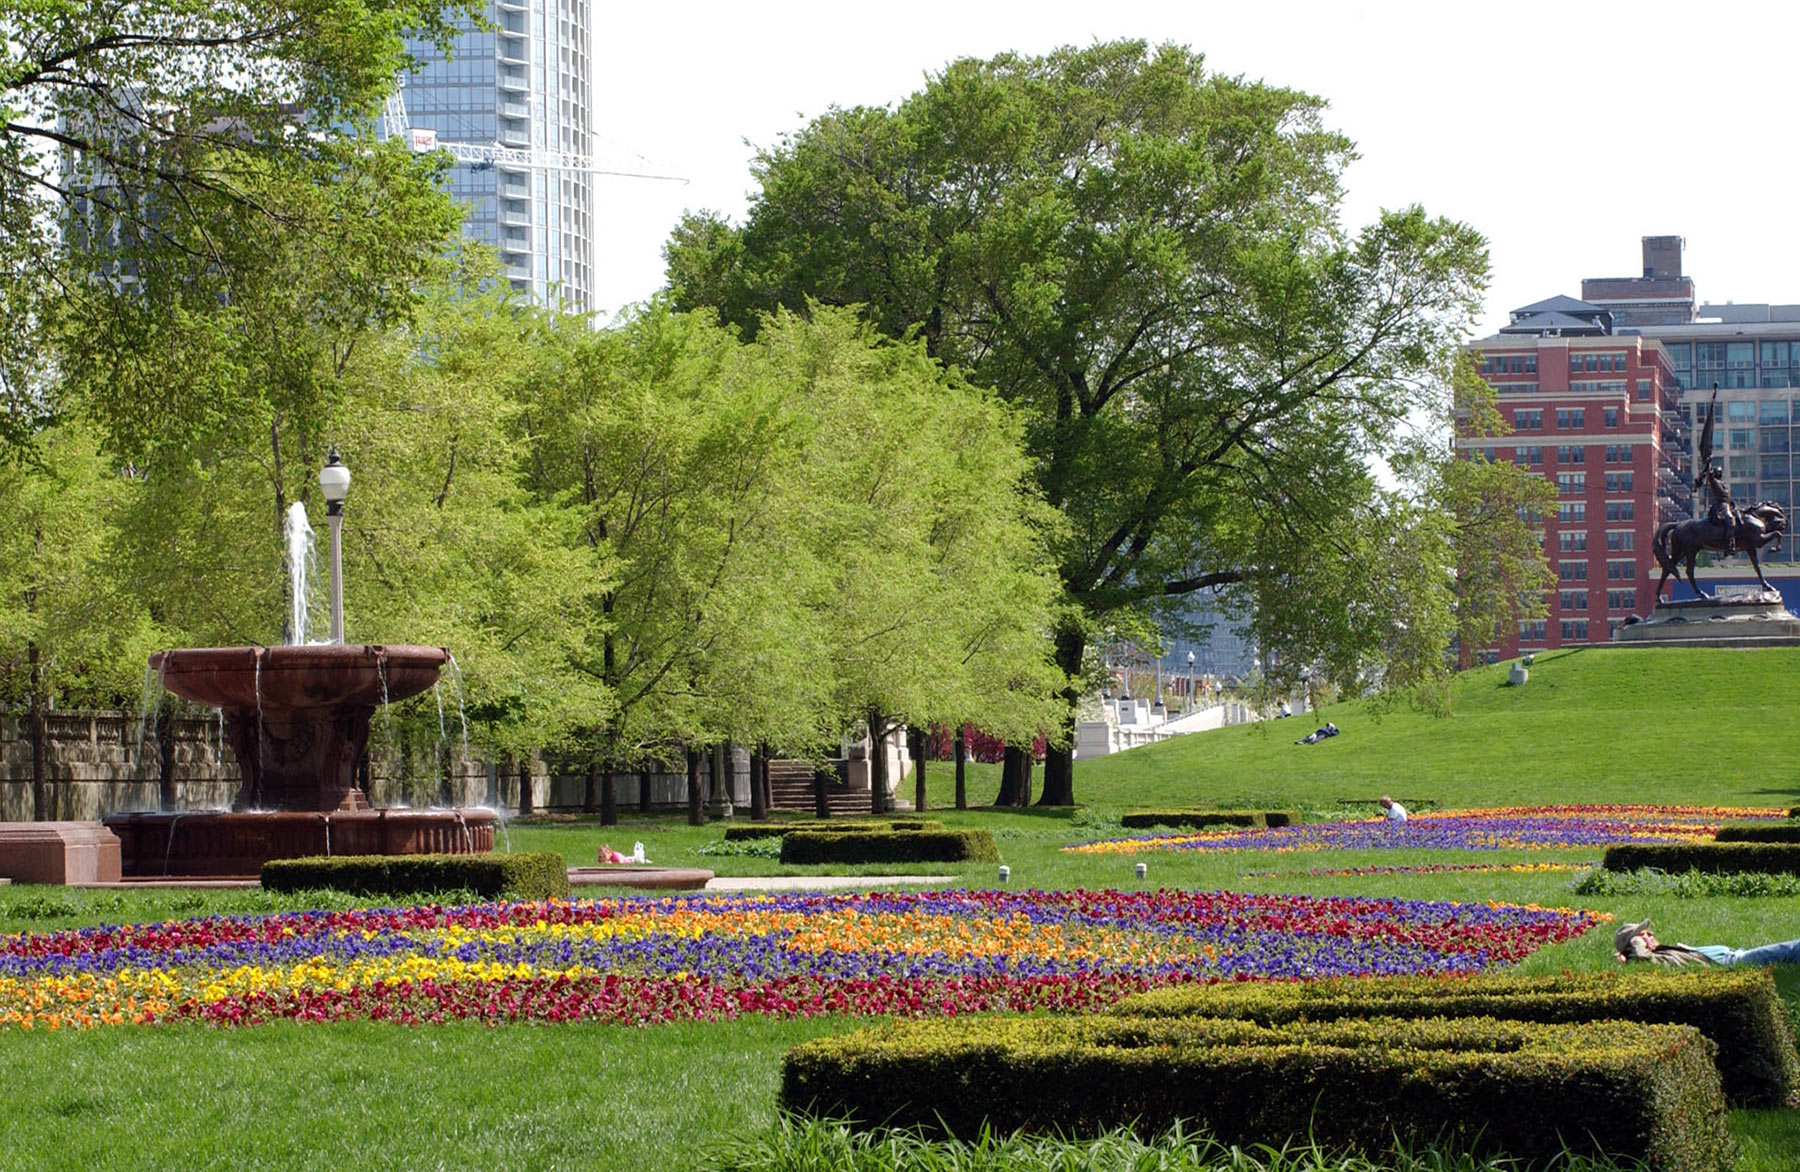 Grant Park Formal Gardens South of E. Balbo Drive. Photo by Julia Bachrach.